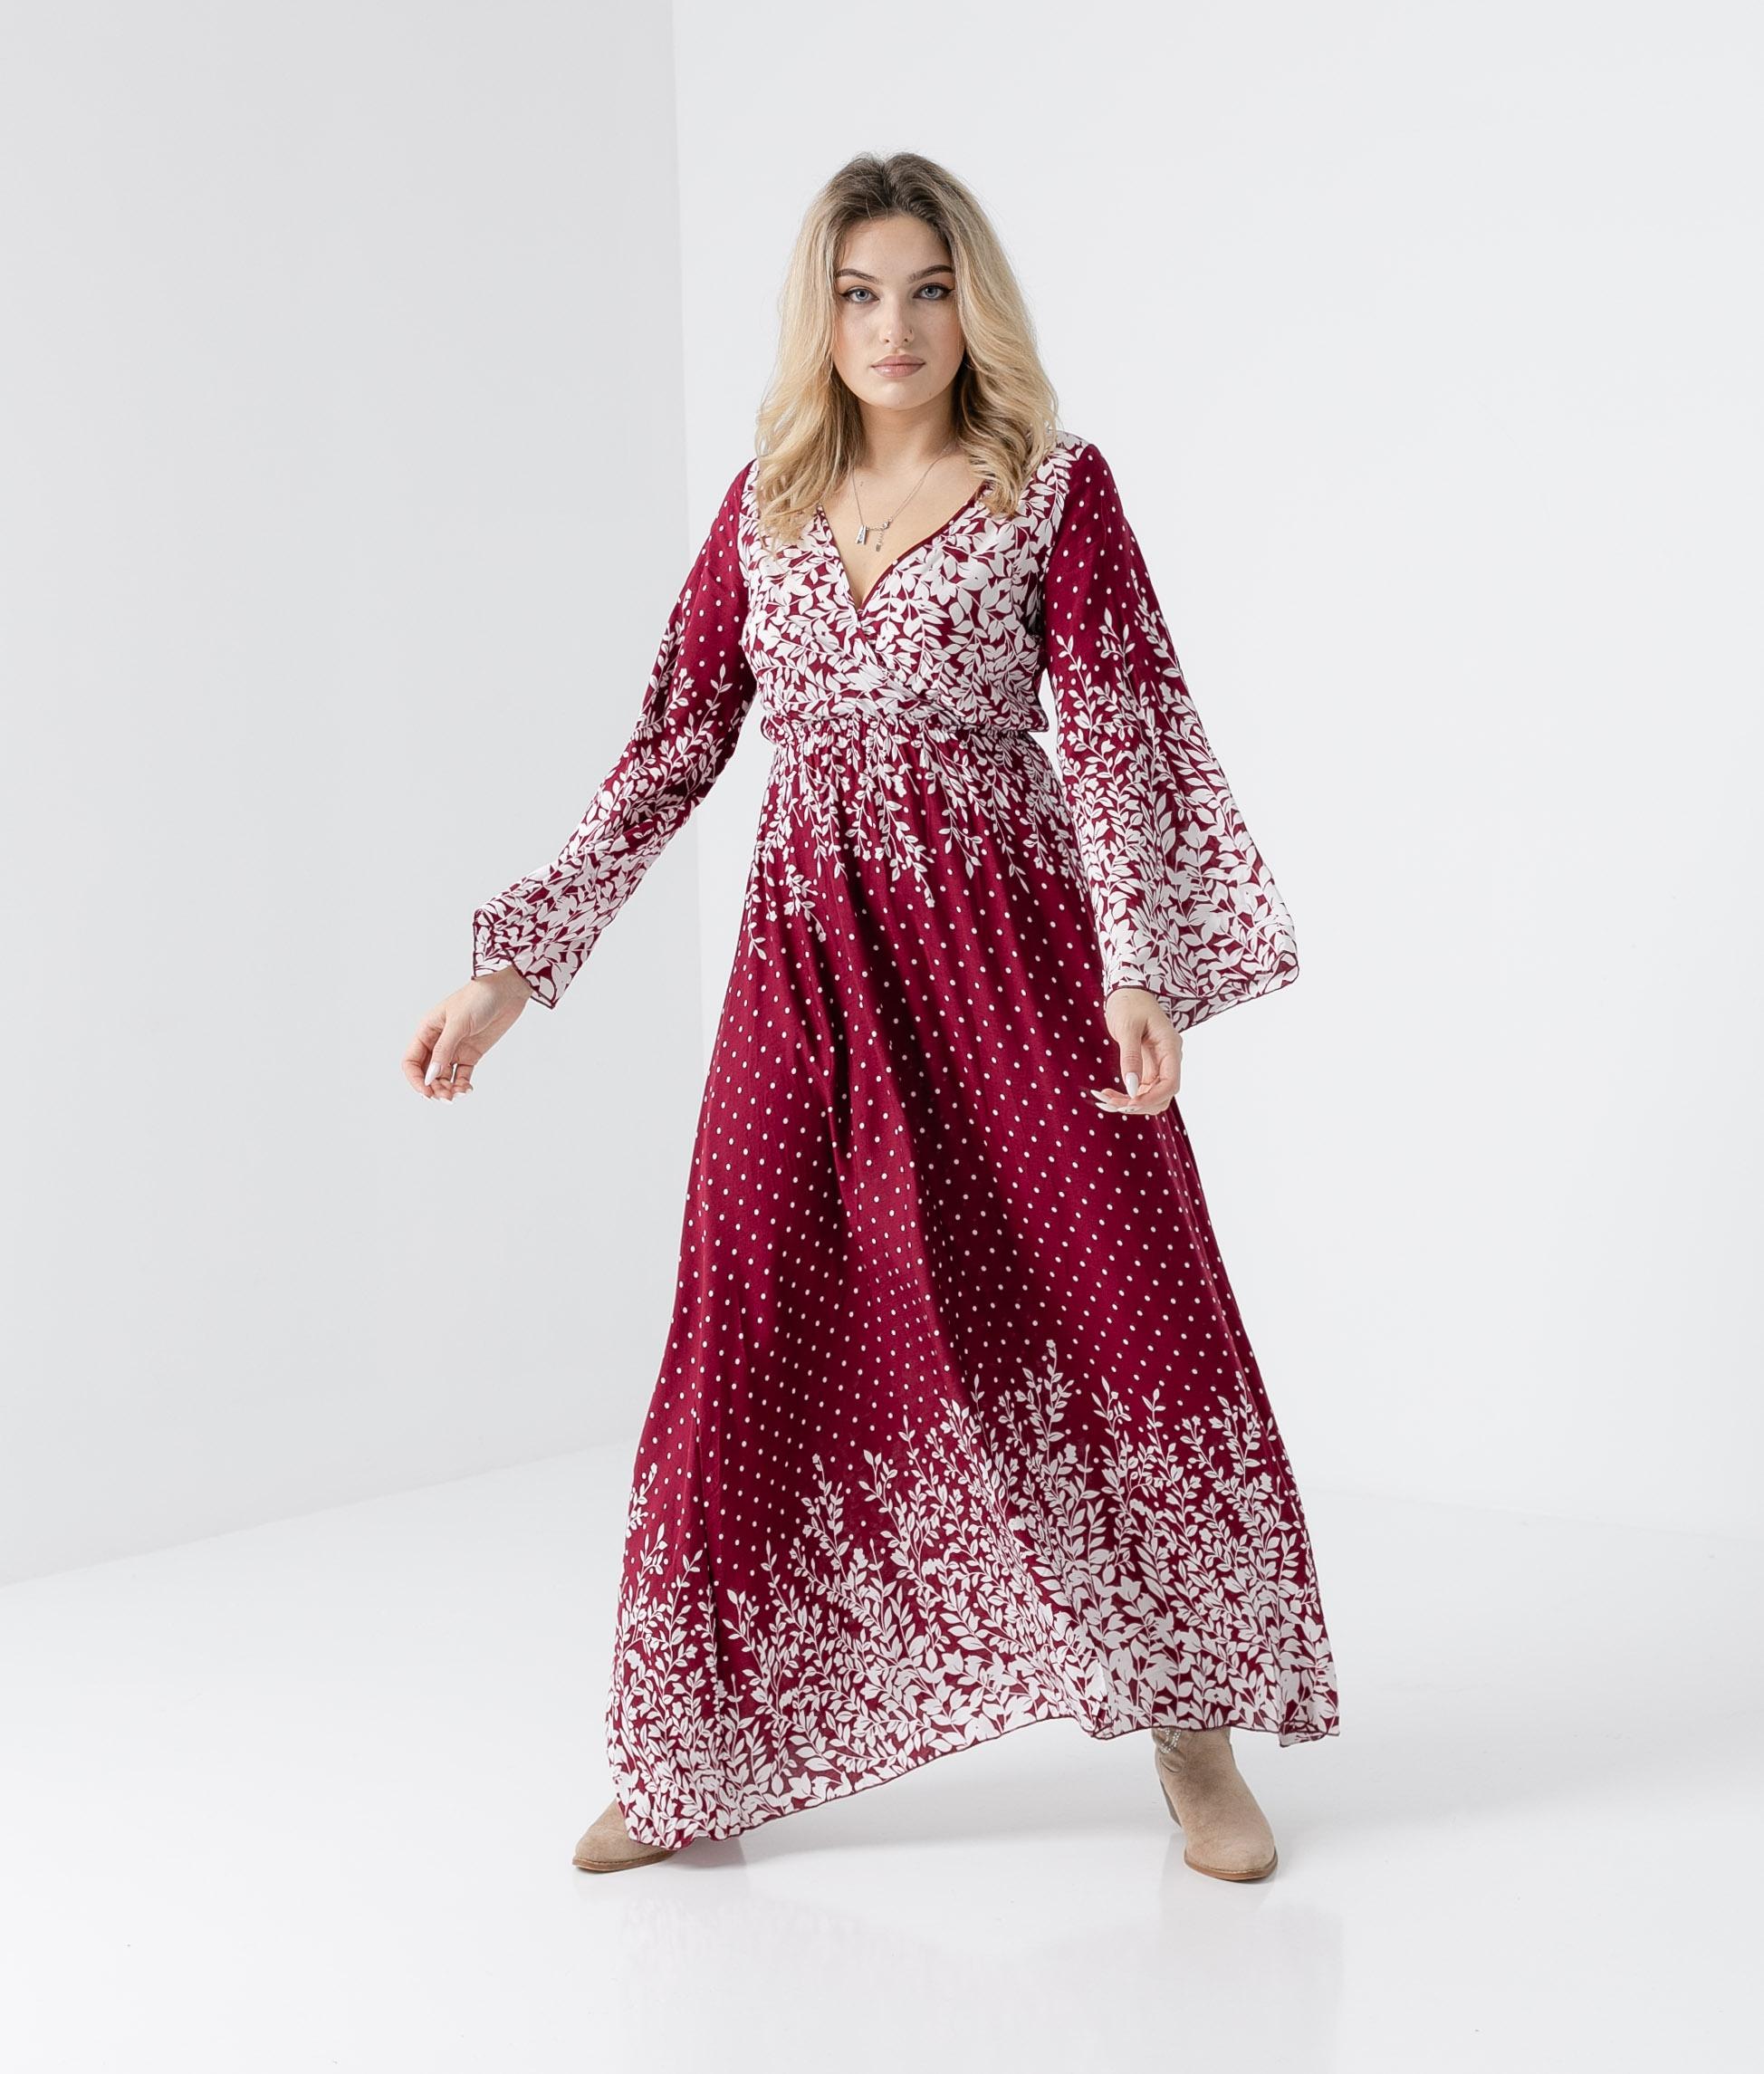 Dress Disfrute - Maroon